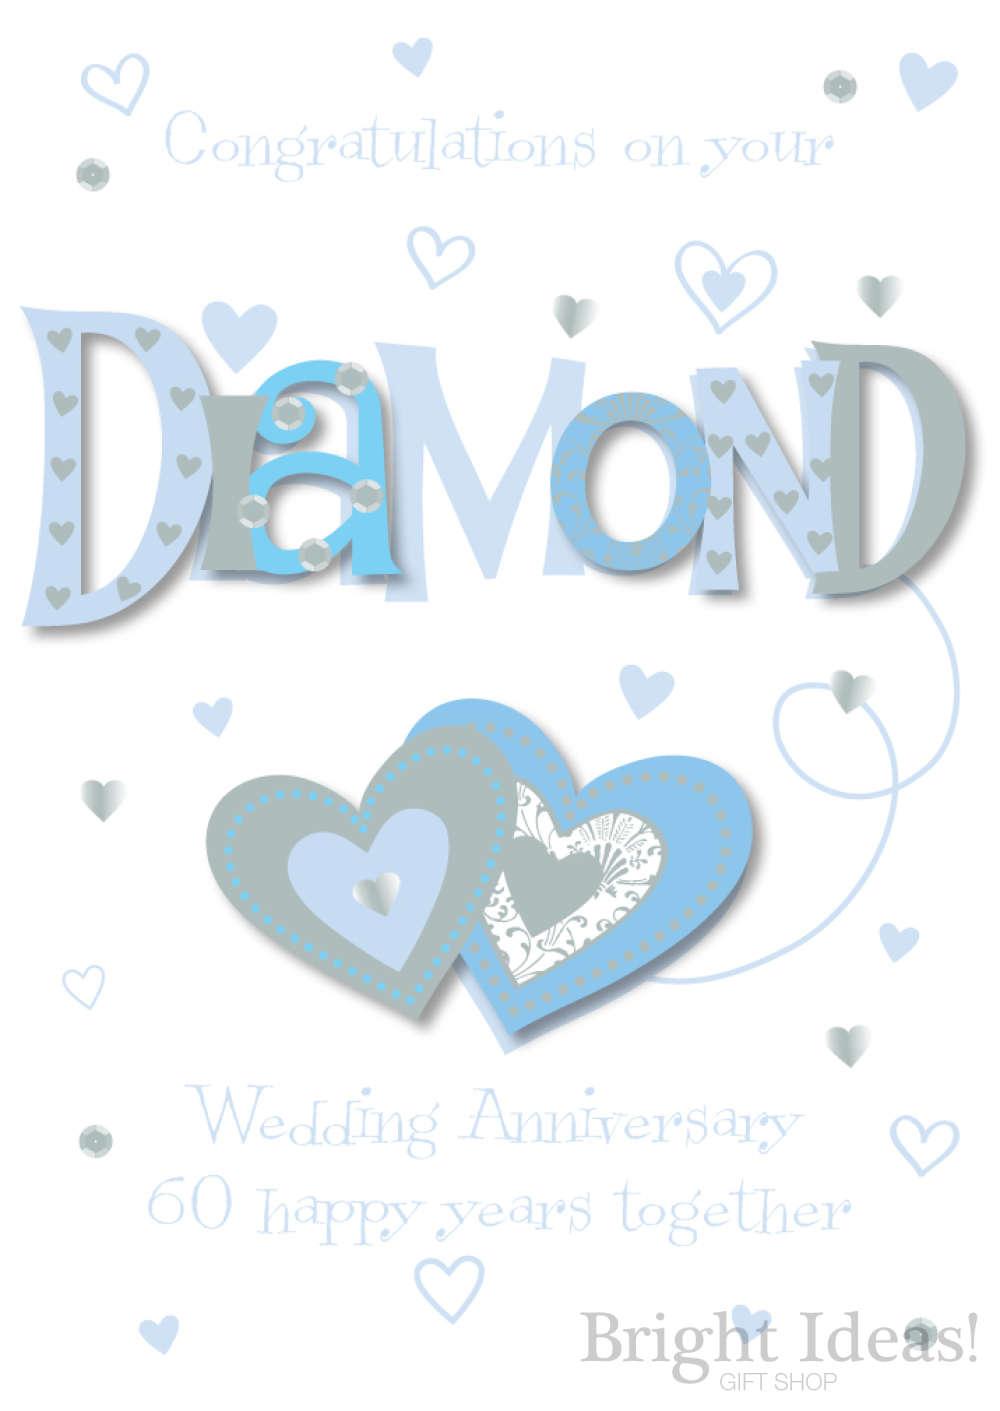 60th Hearts Diamond Wedding Anniversary Card By Ling Design